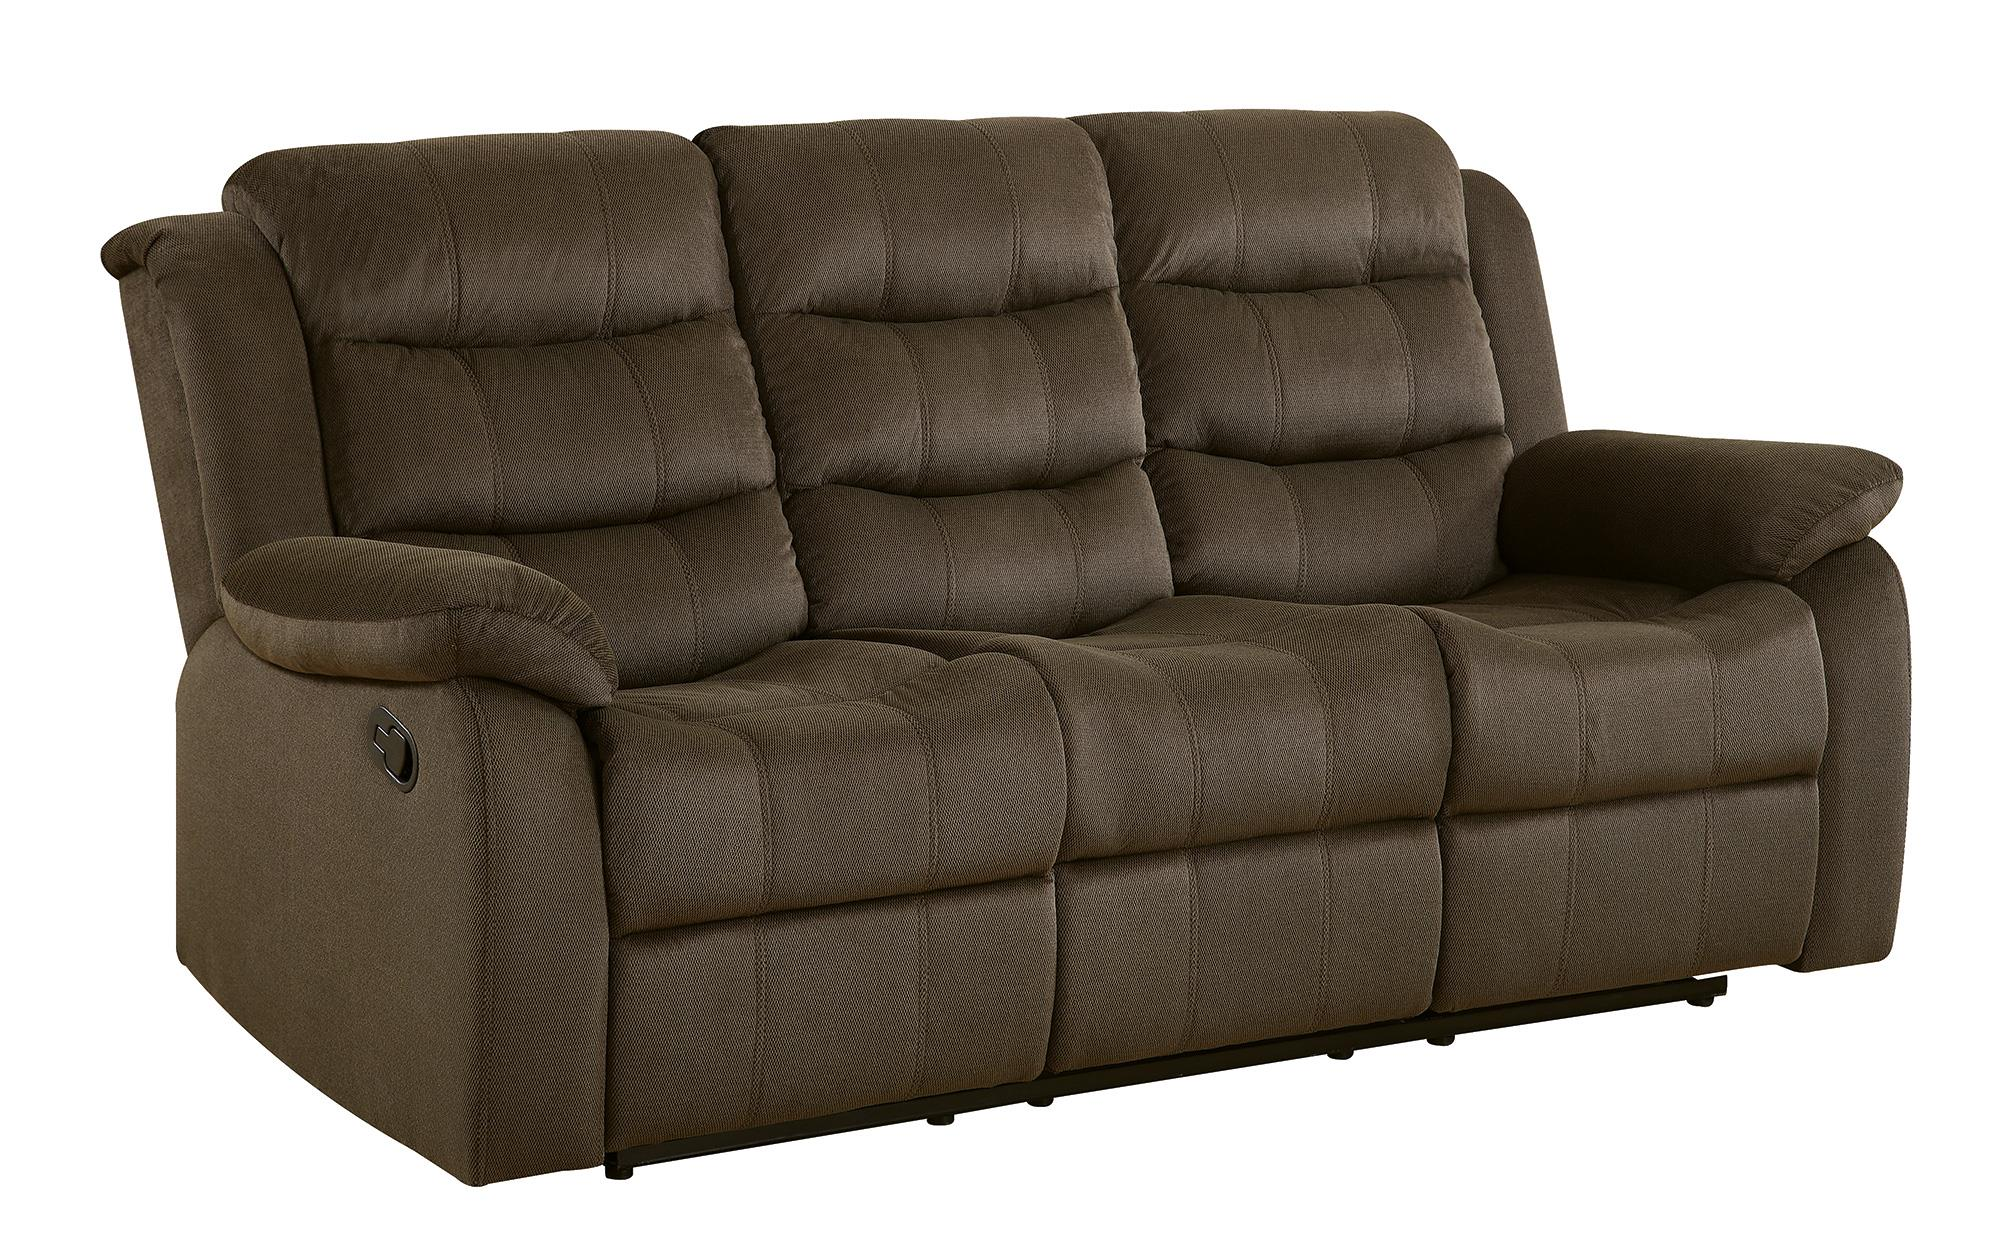 Rodman Motion Sofa by Coaster at Lapeer Furniture & Mattress Center